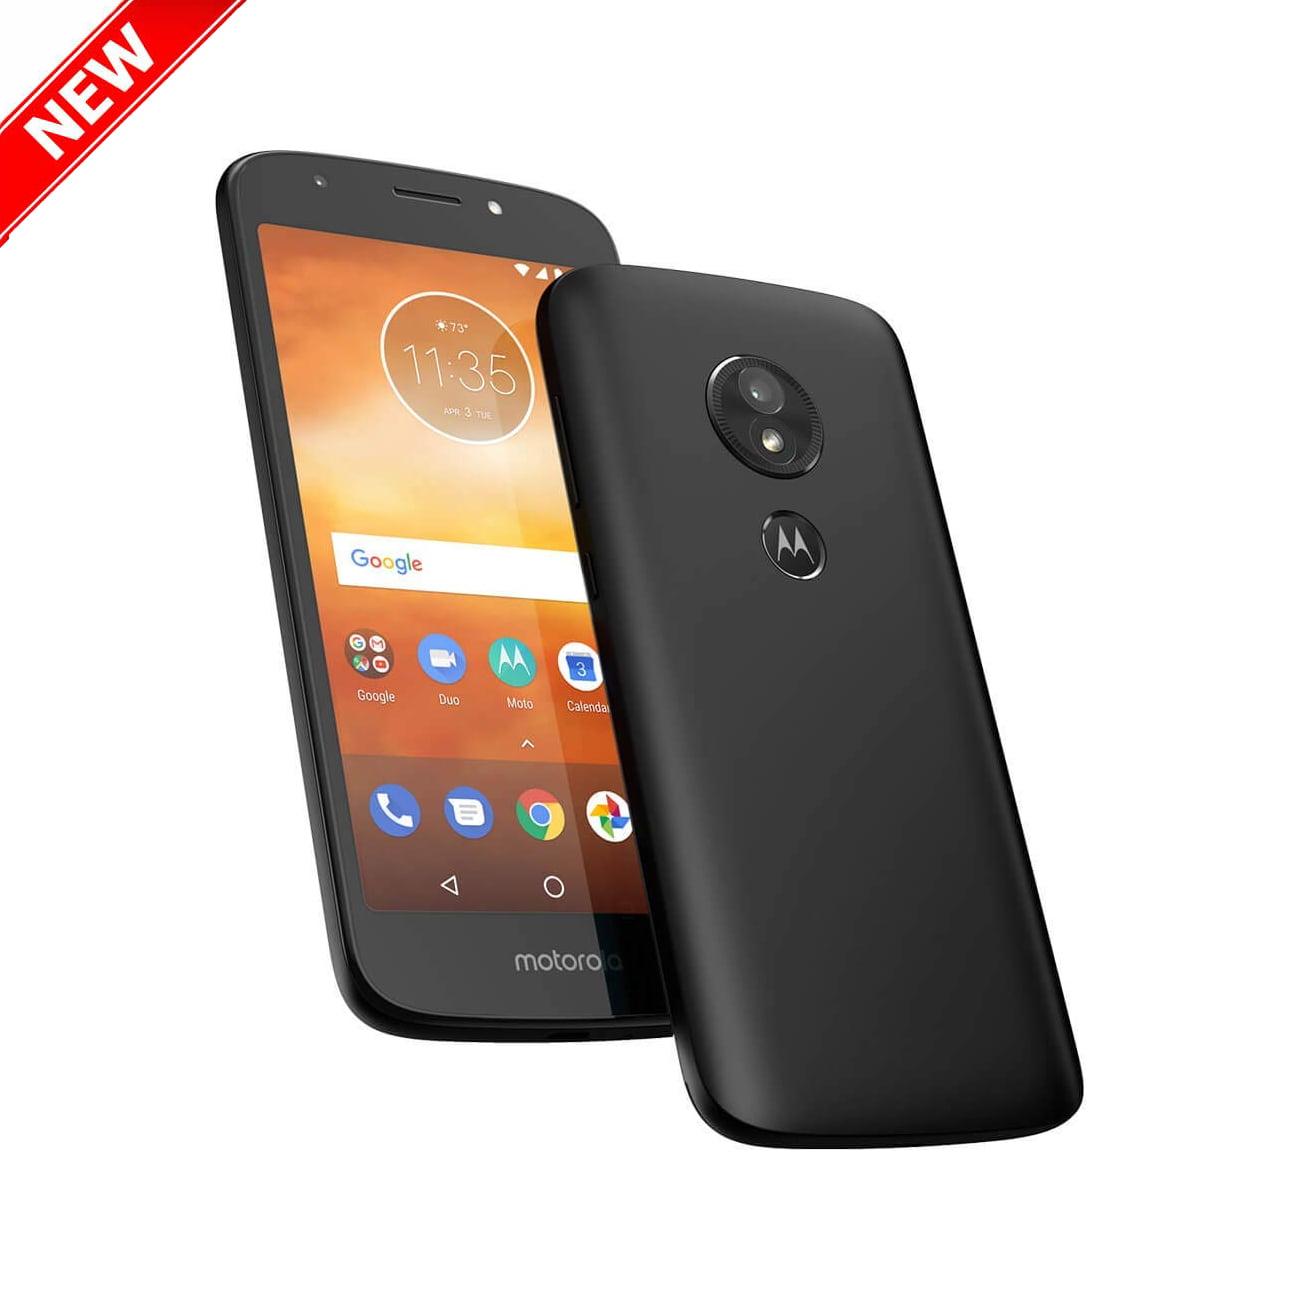 "New Motorola Moto E5 Play 16GB XT1920-19 Dual SIM GSM  Factory Unlocked 4G LTE 5.2"" IPS LCD 2GB RAM 8MP Smartphone - Black - International Version"